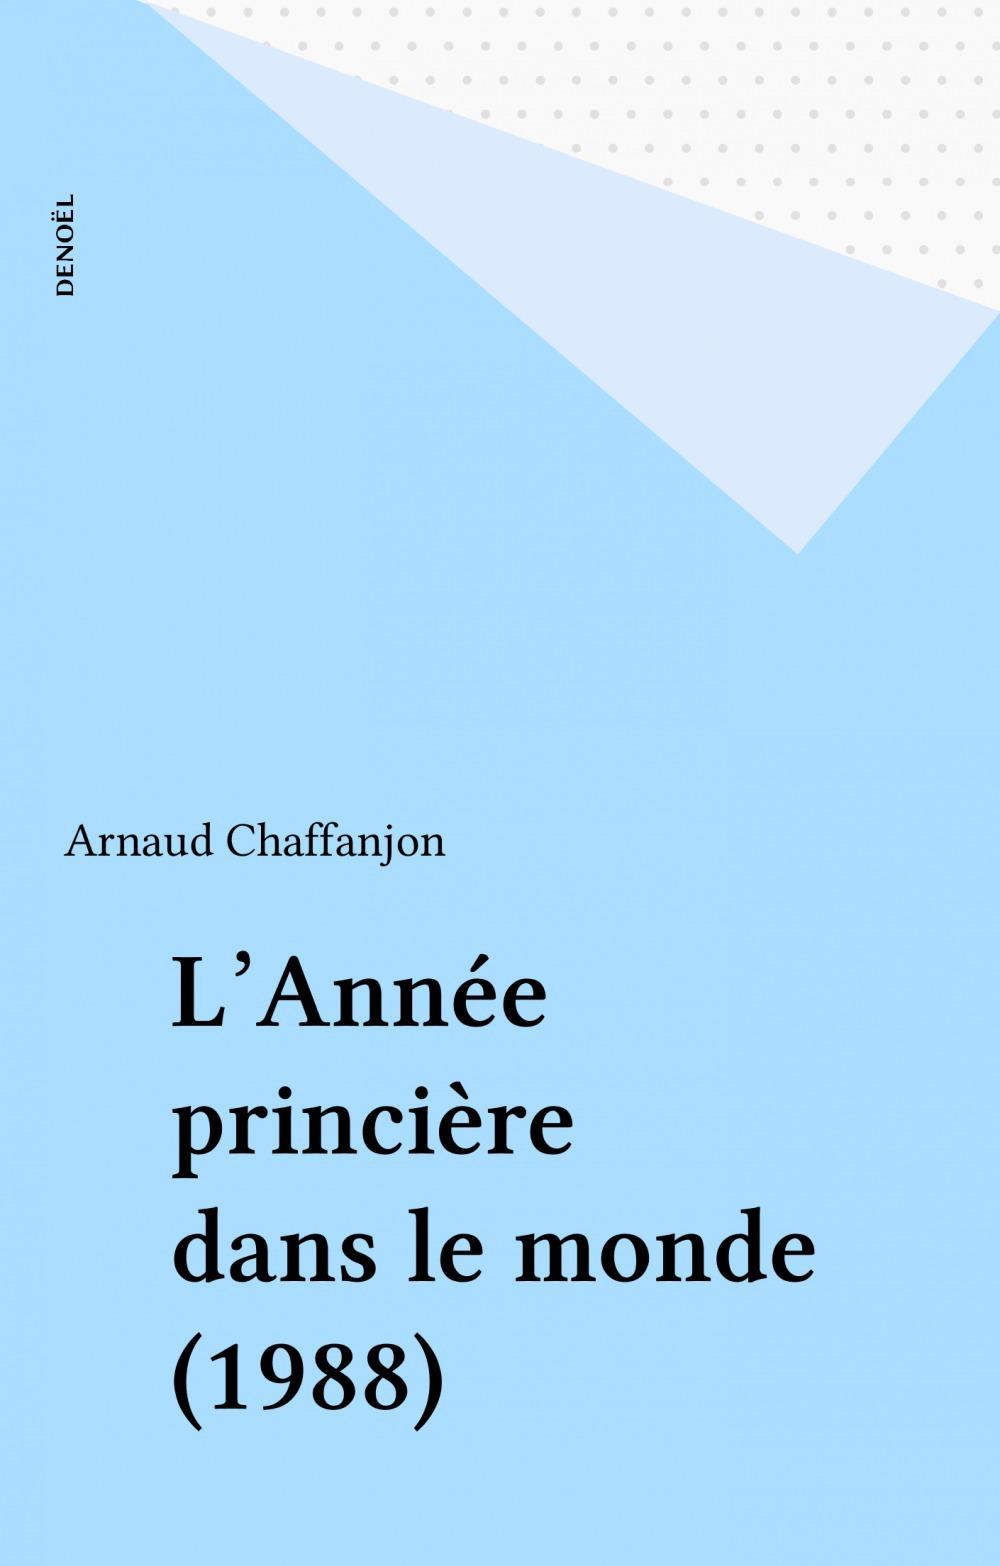 Annee princ dan le mon 8 (annee princiere 88)